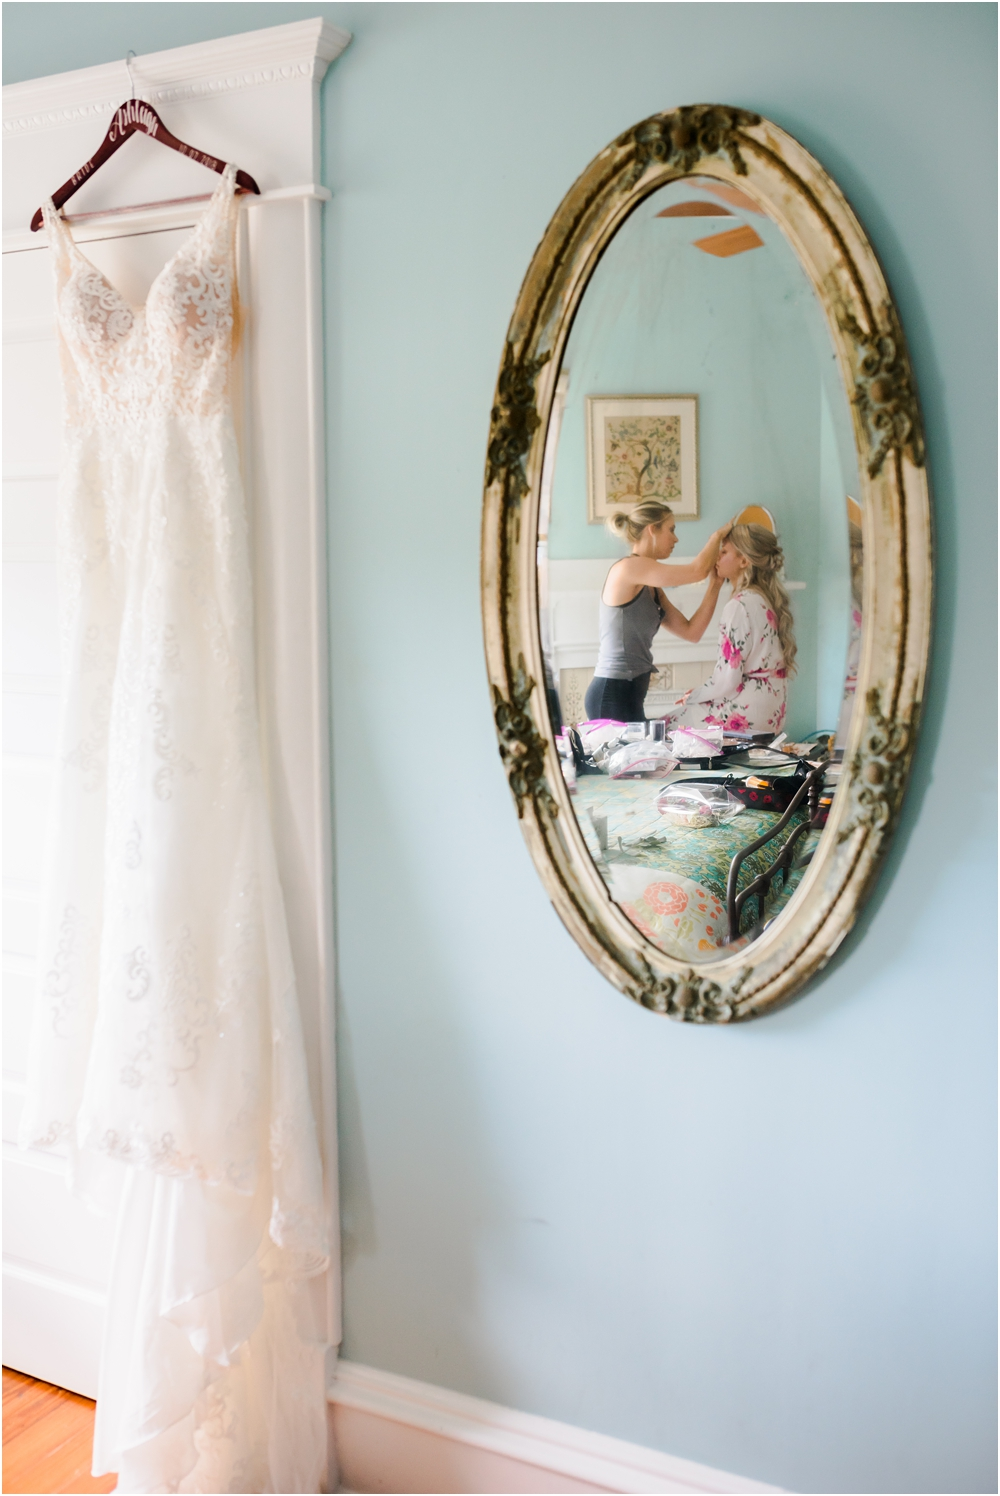 mcglothlin-wedding-kiersten-stevenson-photography-30a-panama-city-beach-dothan-tallahassee-(16-of-145).jpg